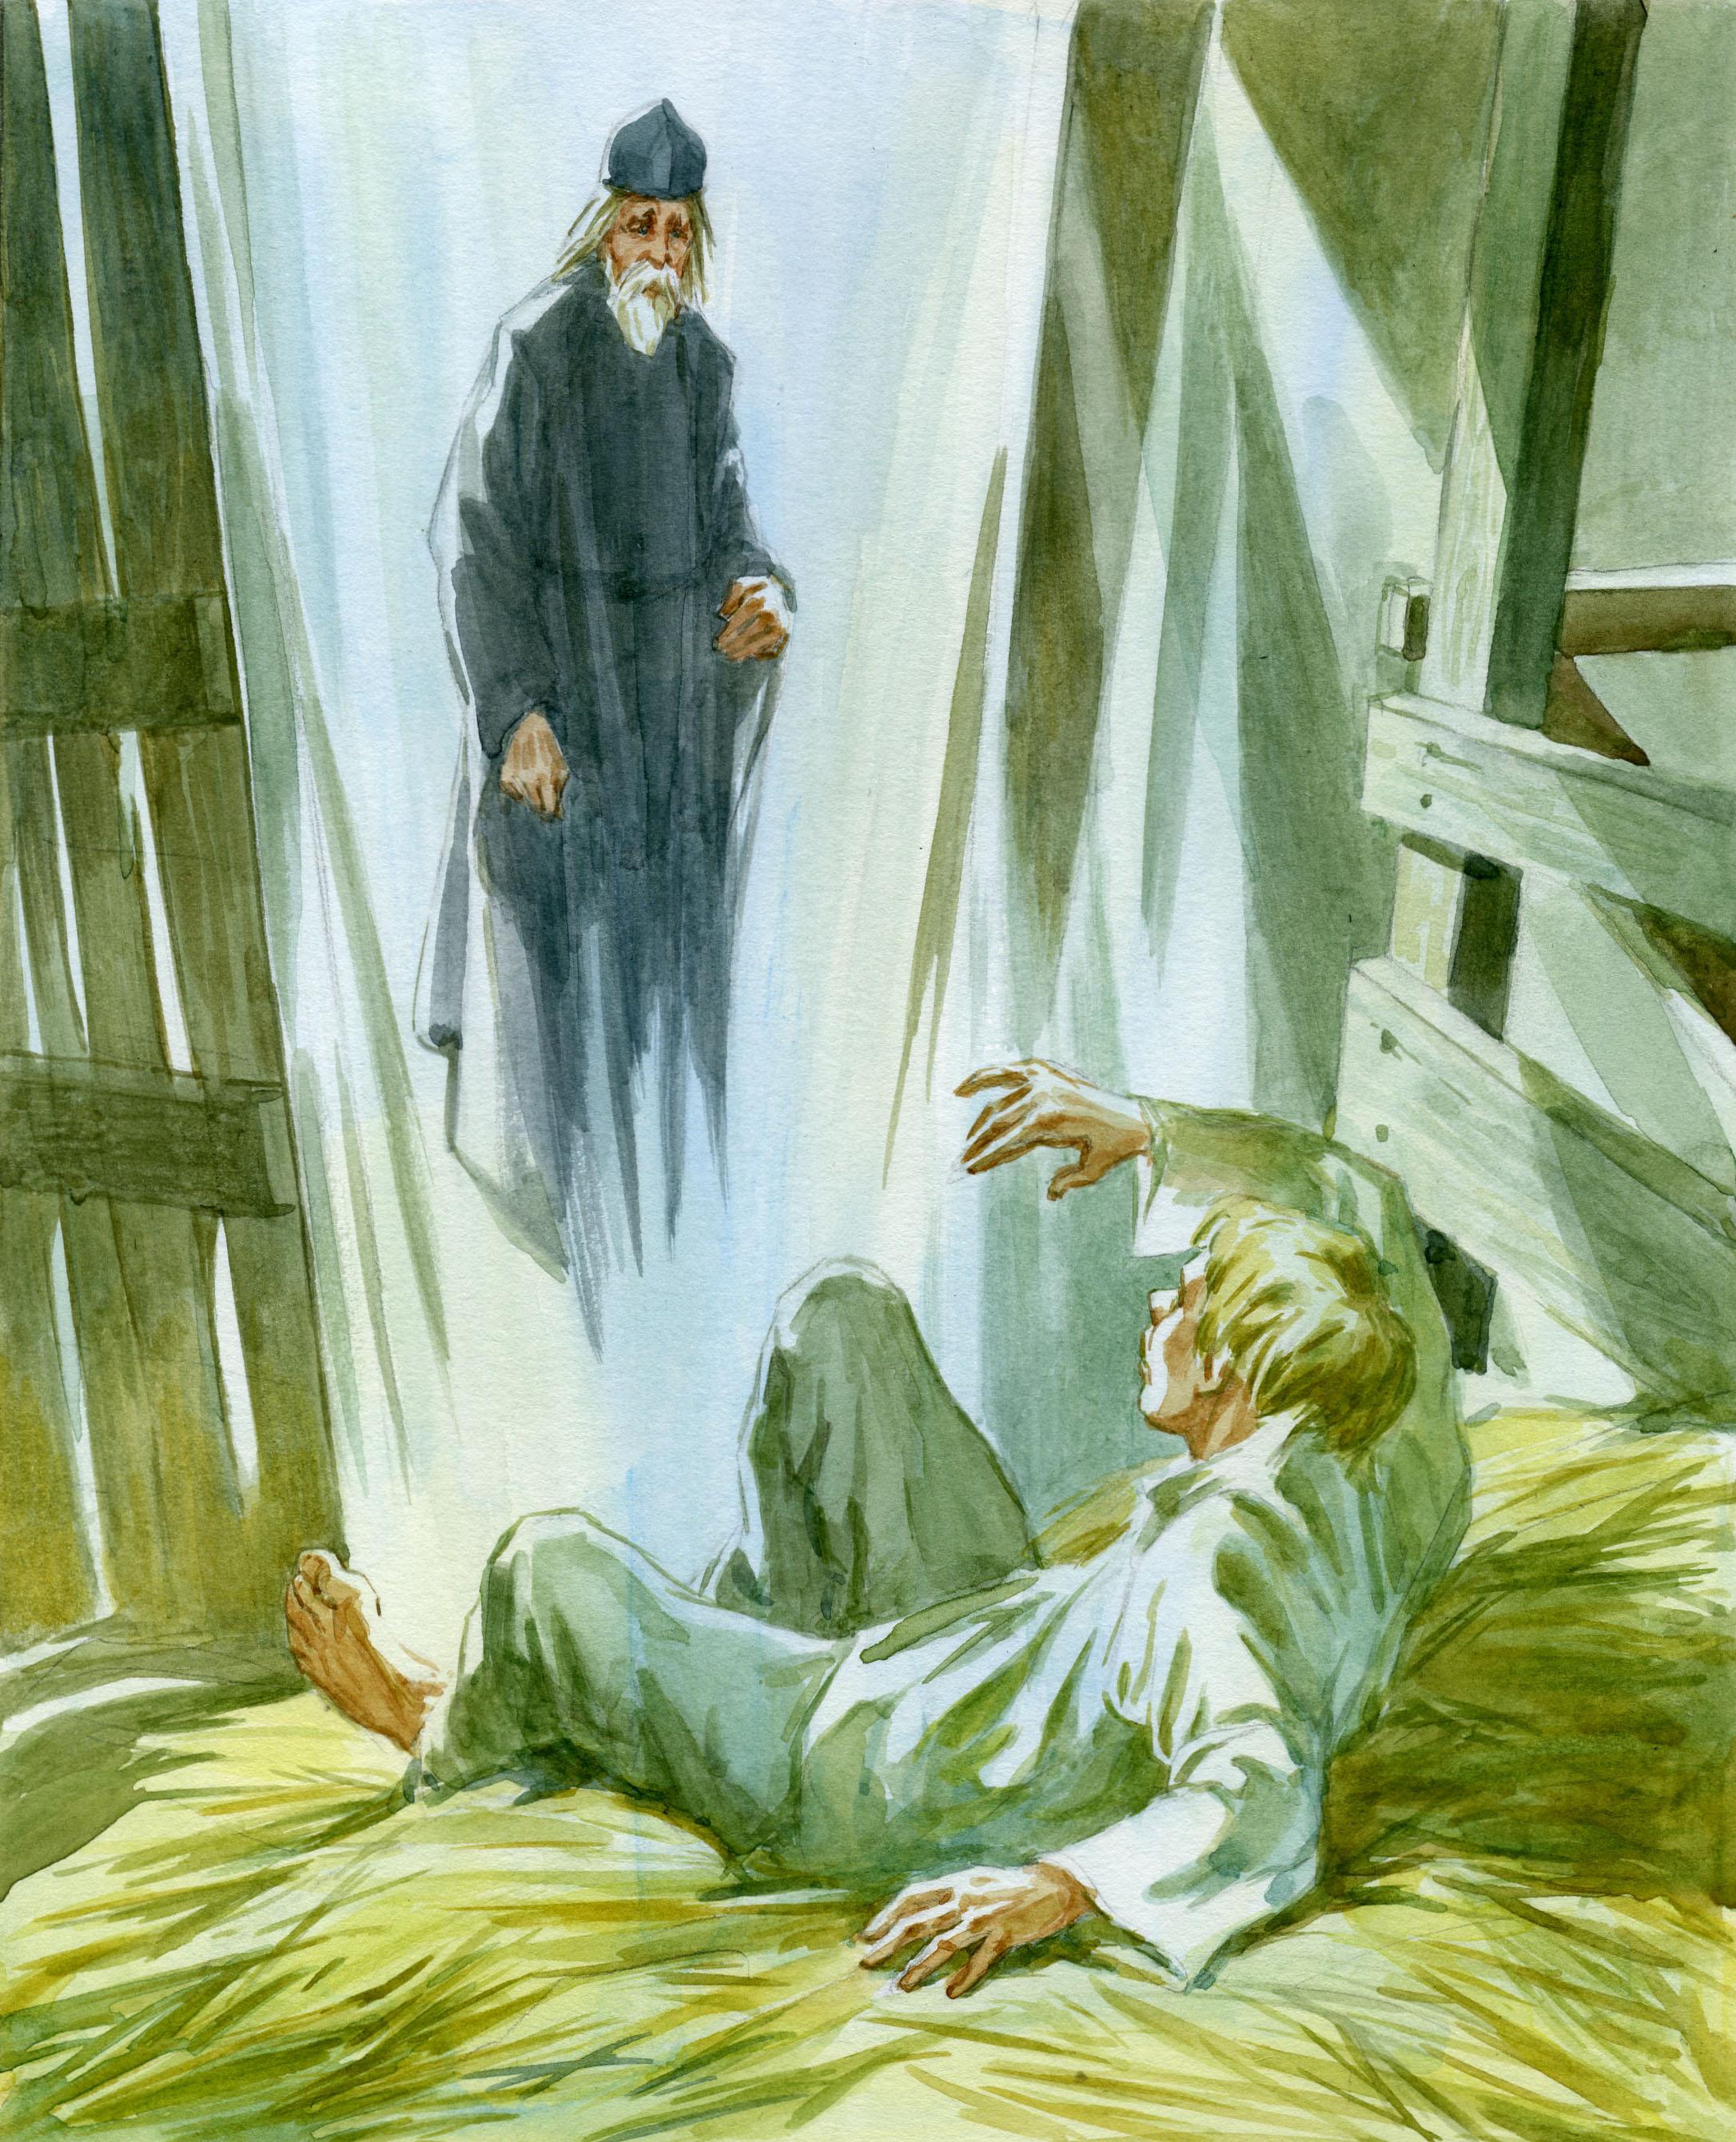 явление монаха